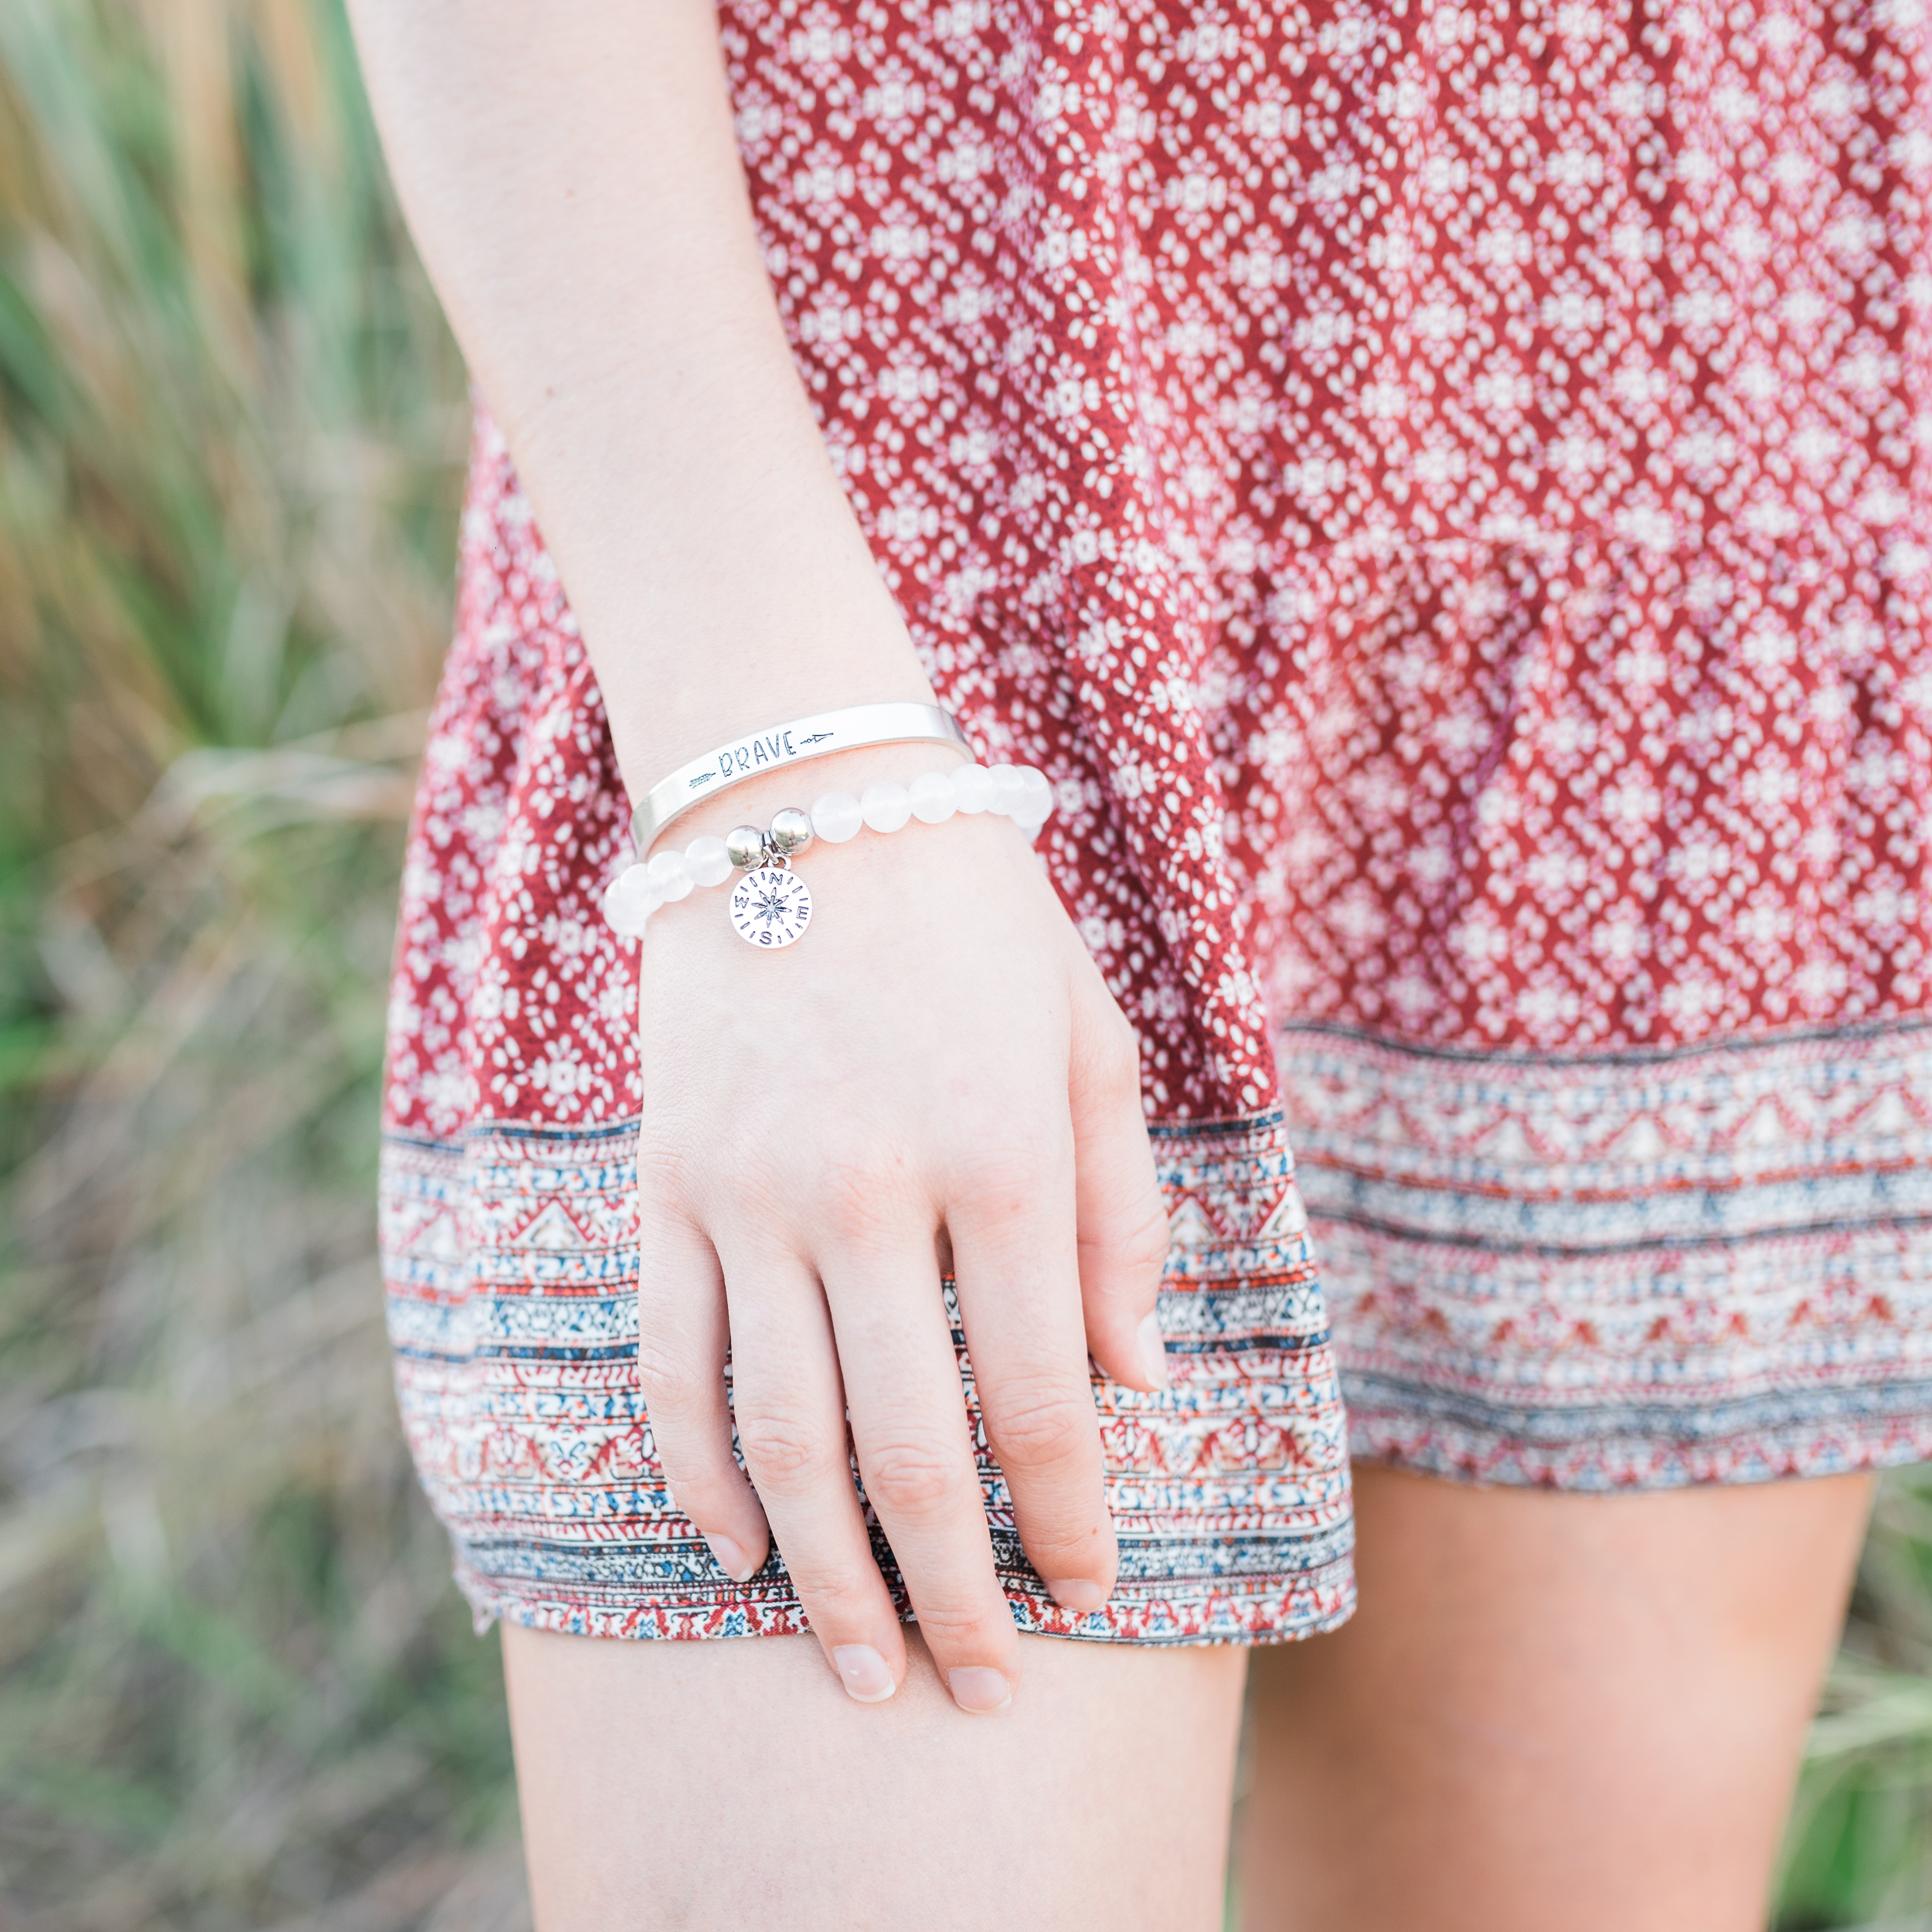 jewelry-branding-photography-guam-roxanne-augusta-15.jpg